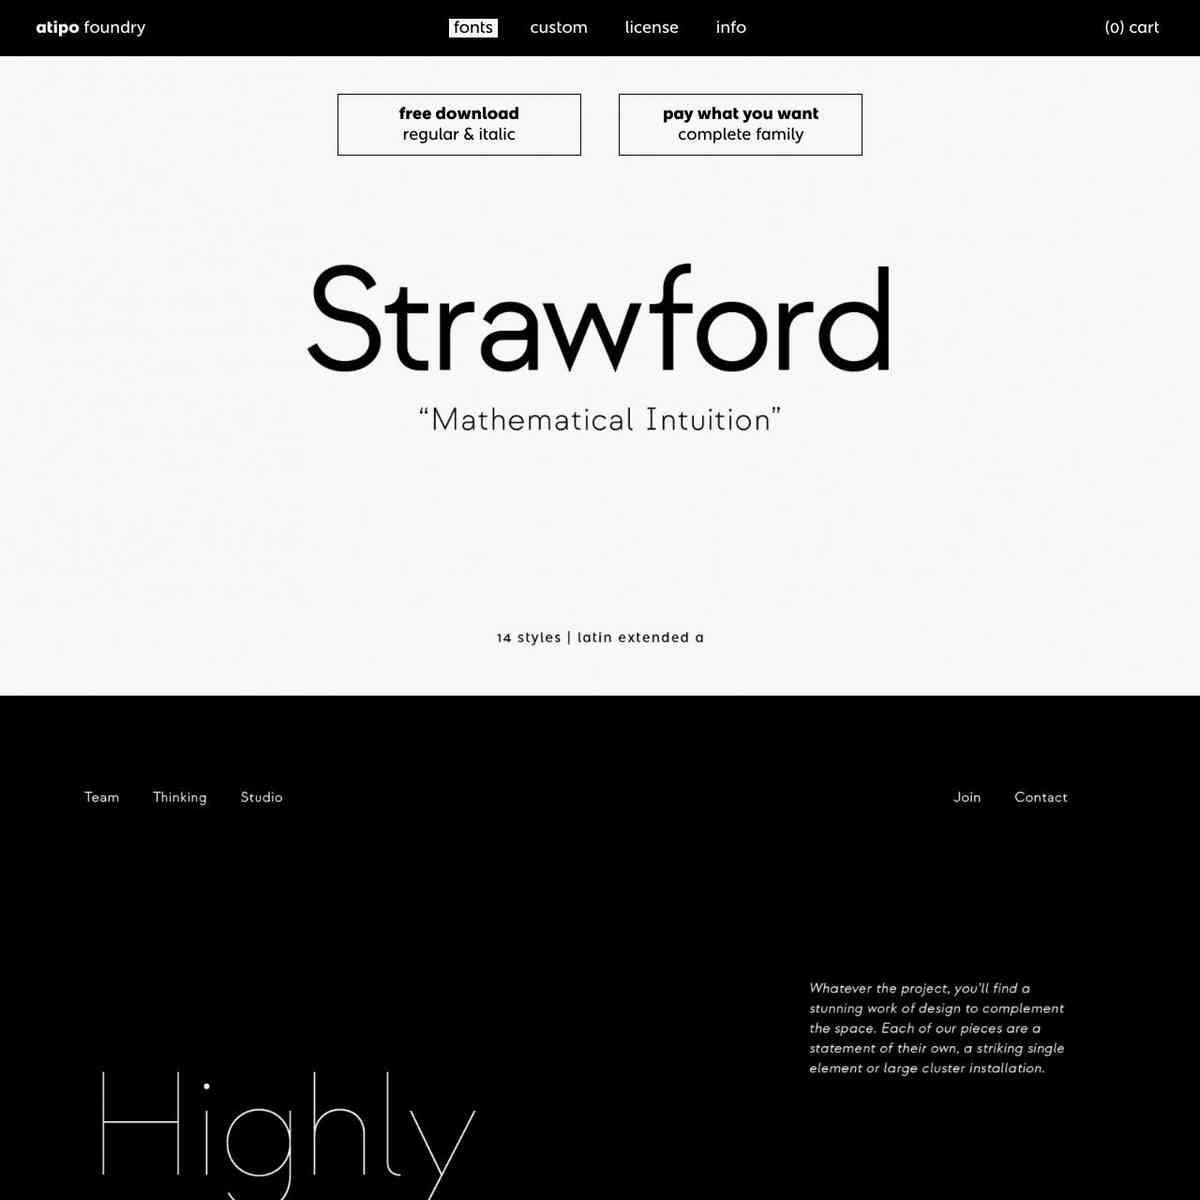 strawford   atipo foundry